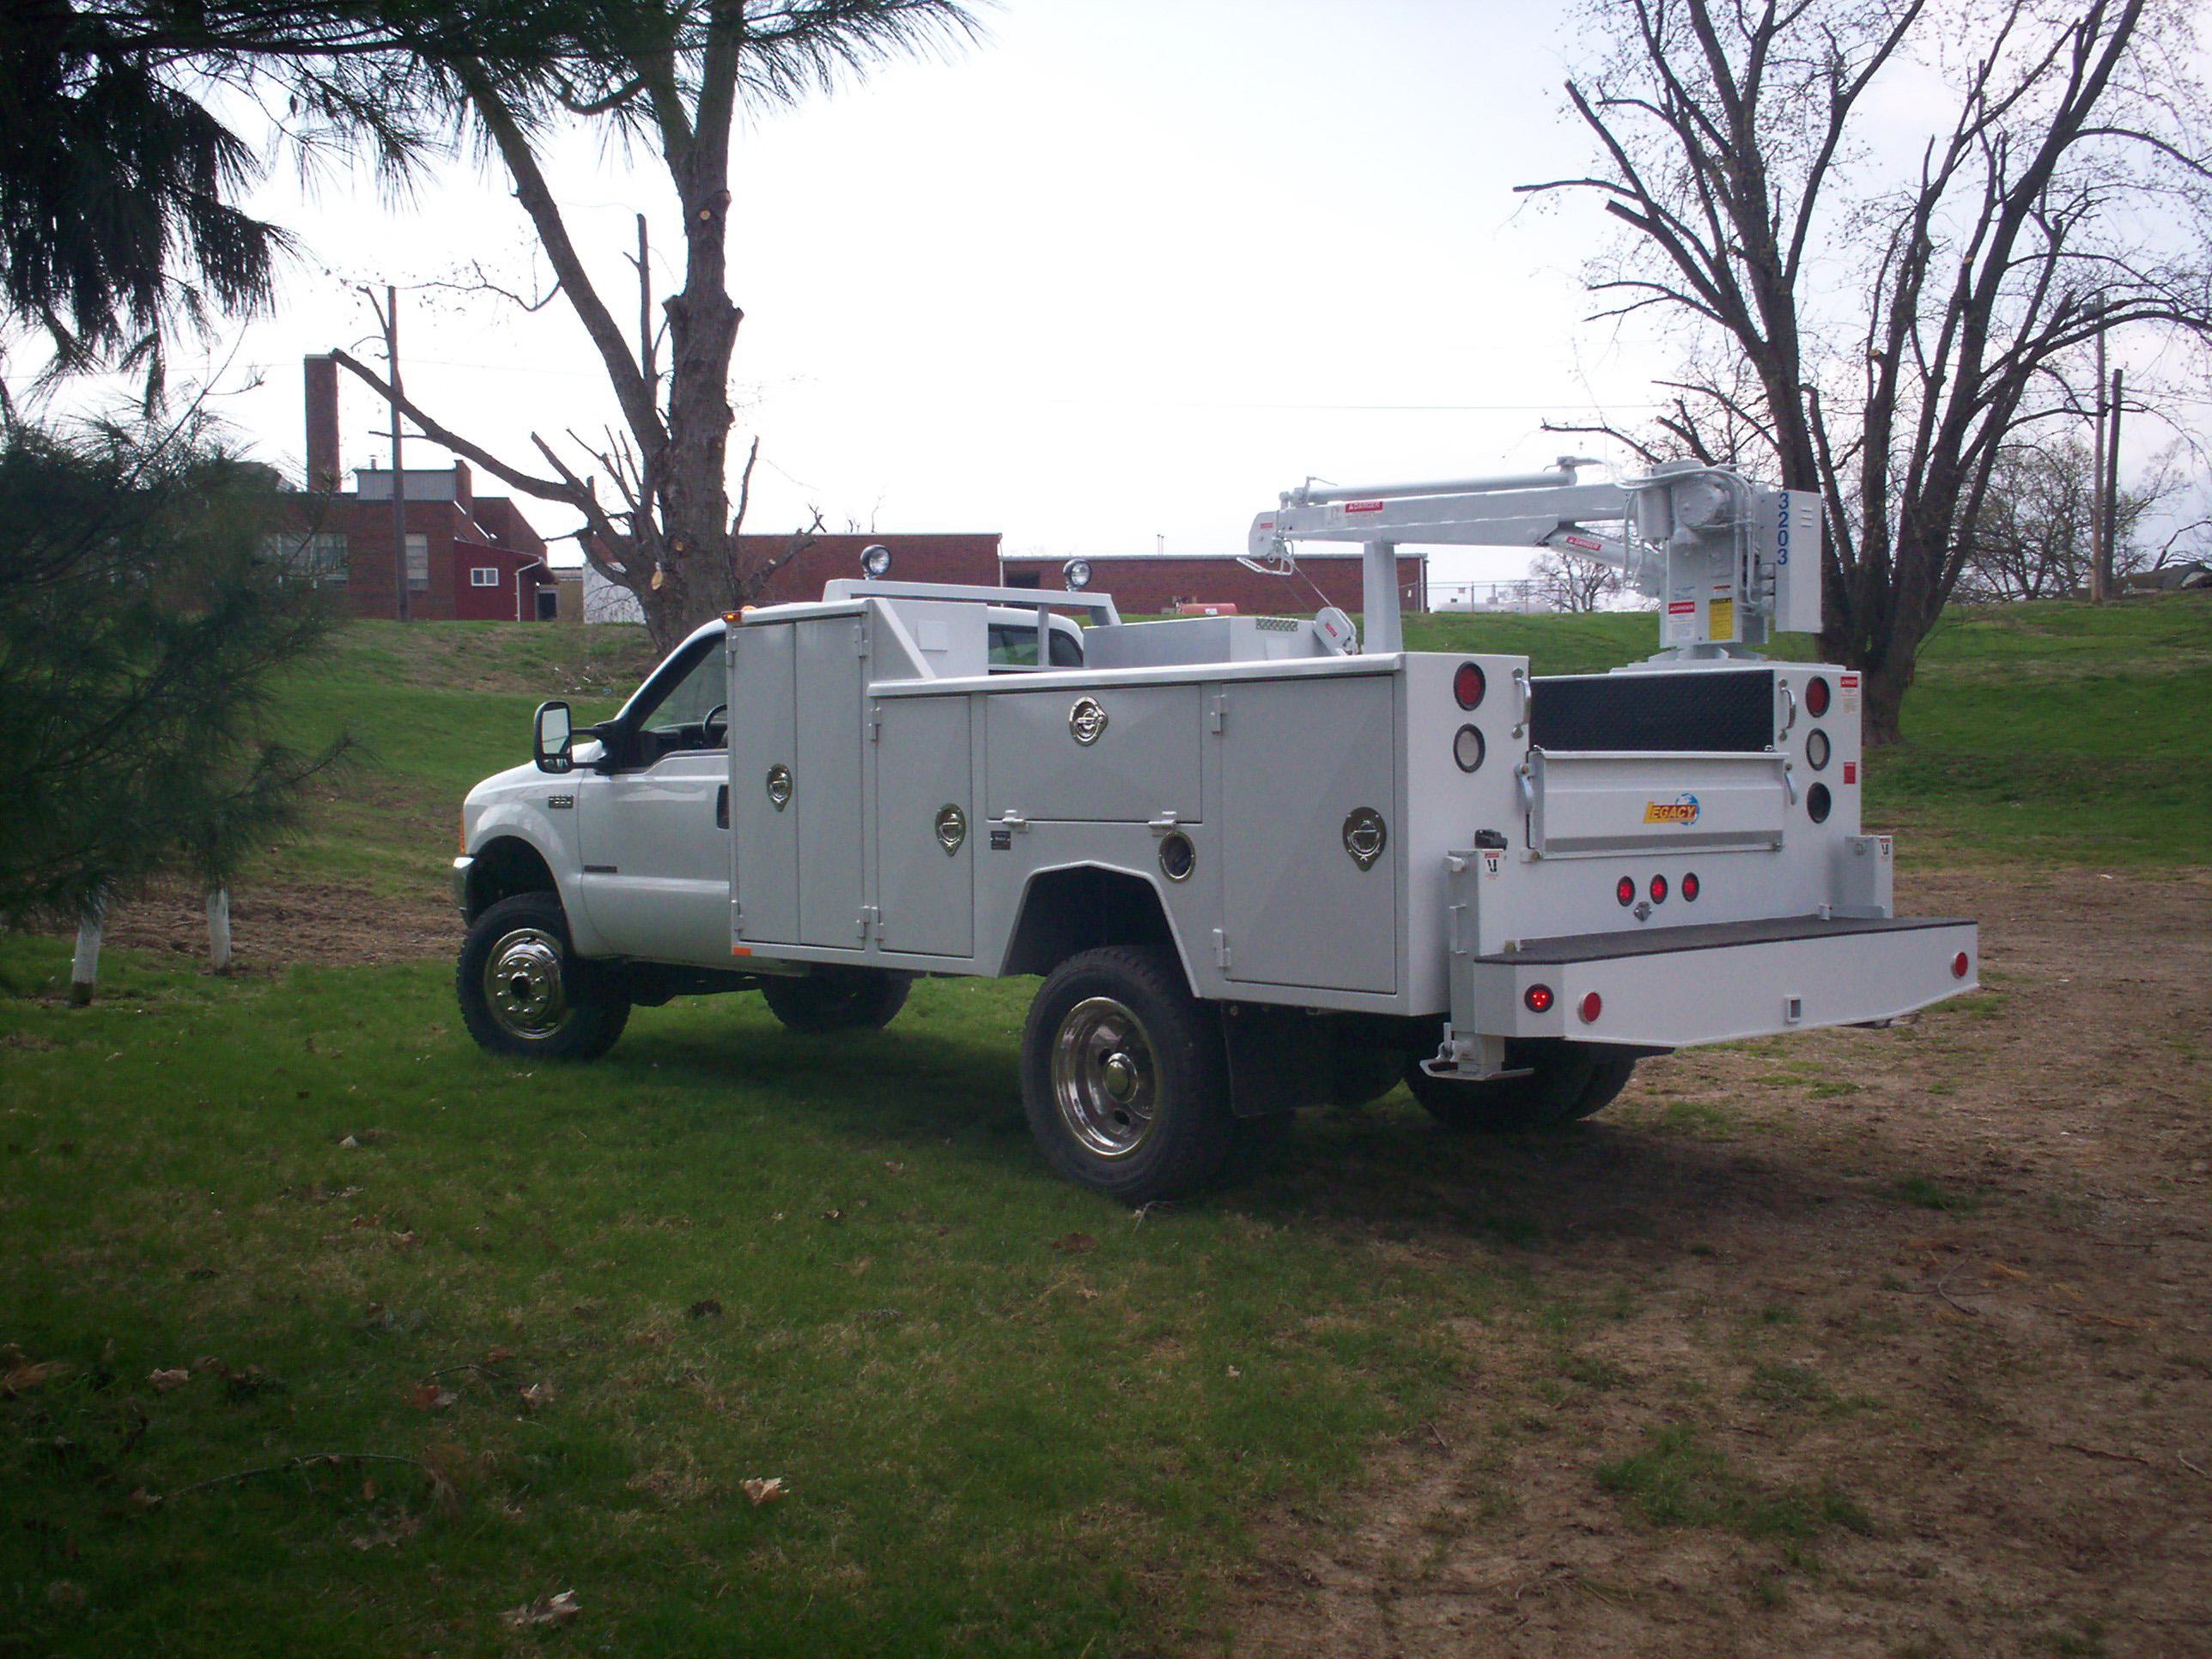 84 inch cab to axle crane body